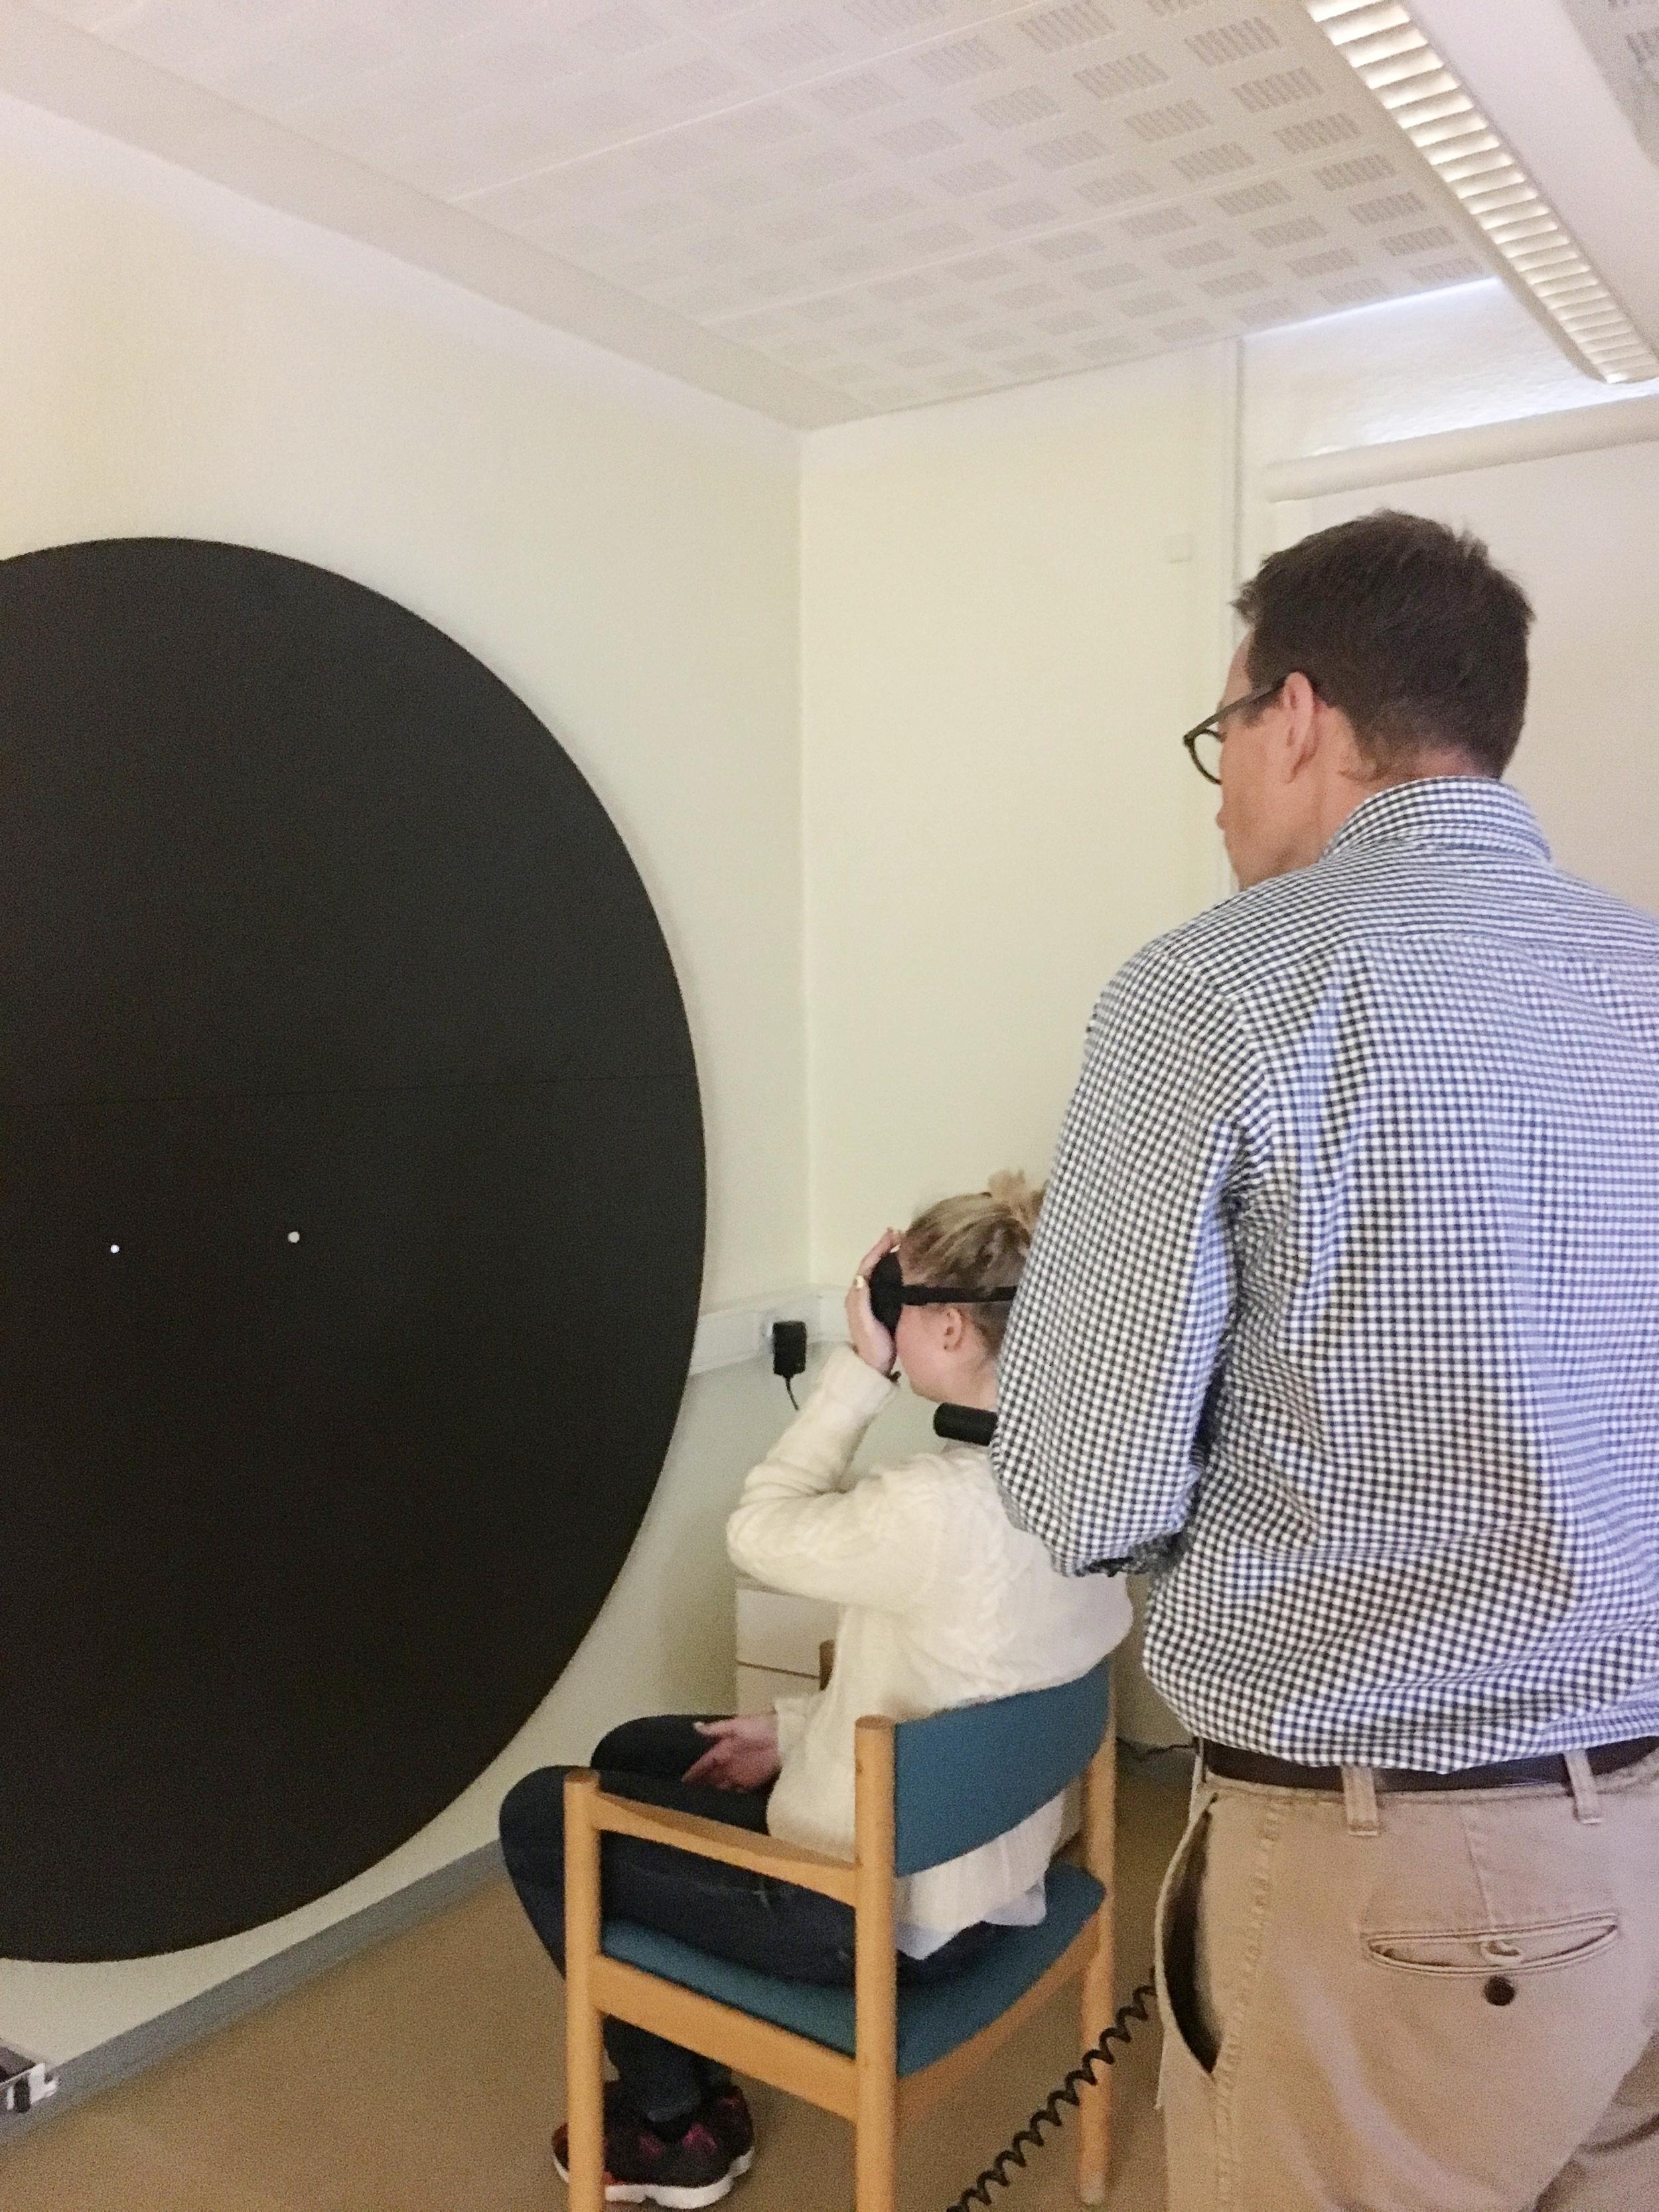 Helle tester synsfiltre i Vordingborg, her med en kampmetritavle